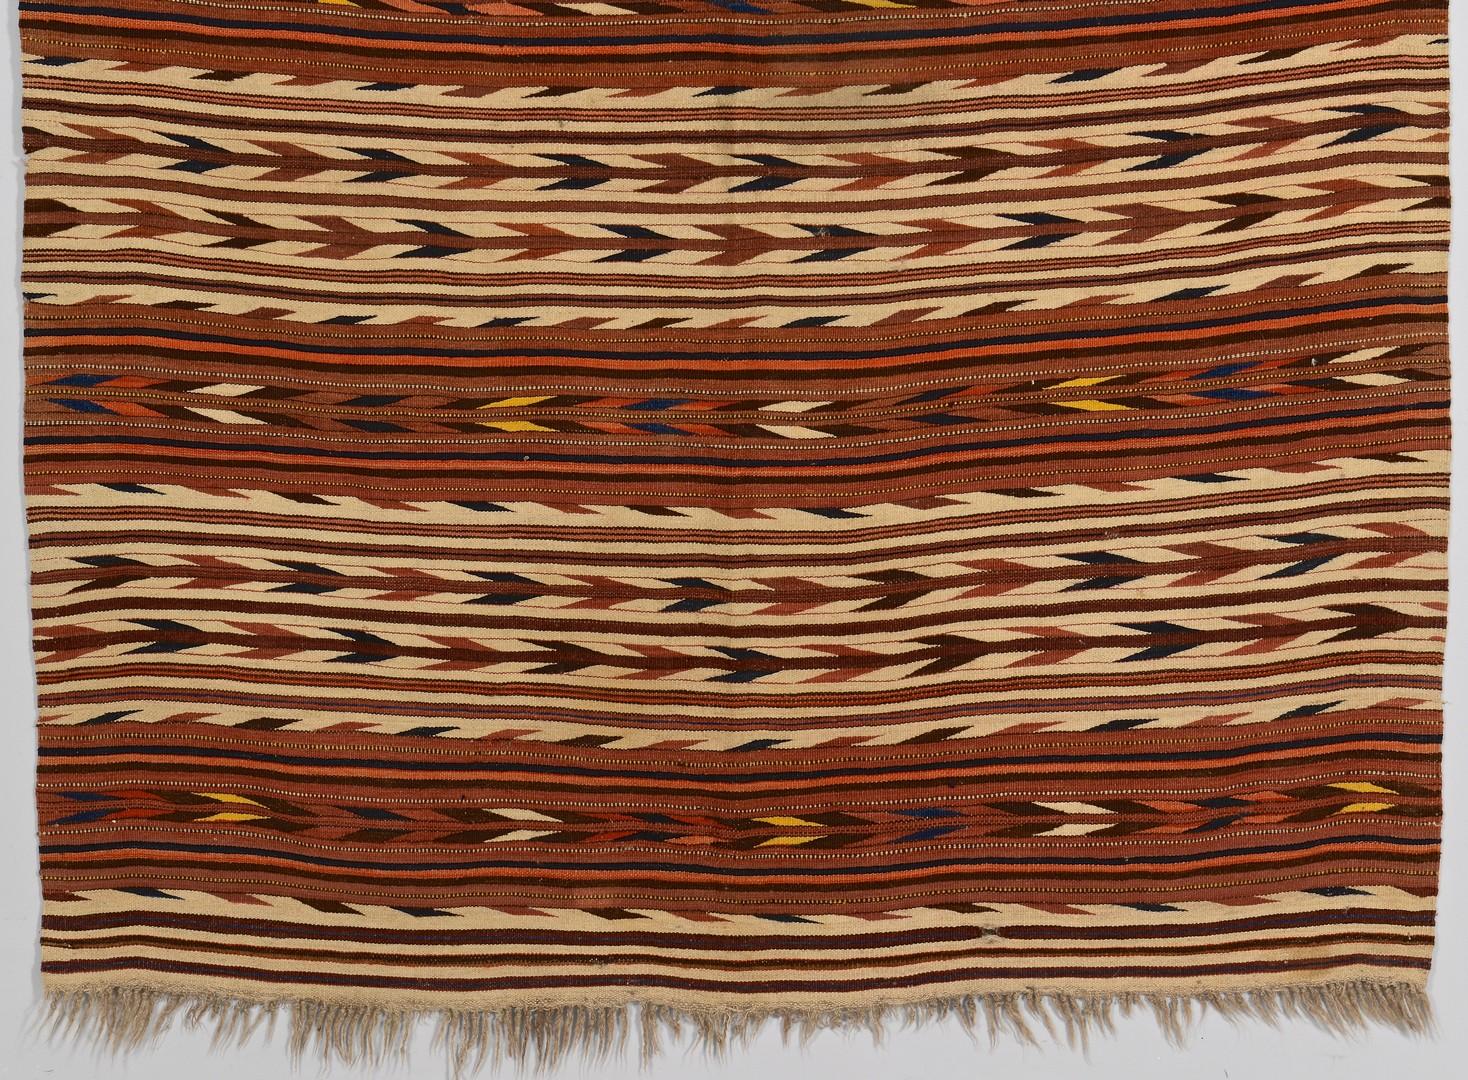 Lot 517: Early Saltillo Serapi Mexican Weaving